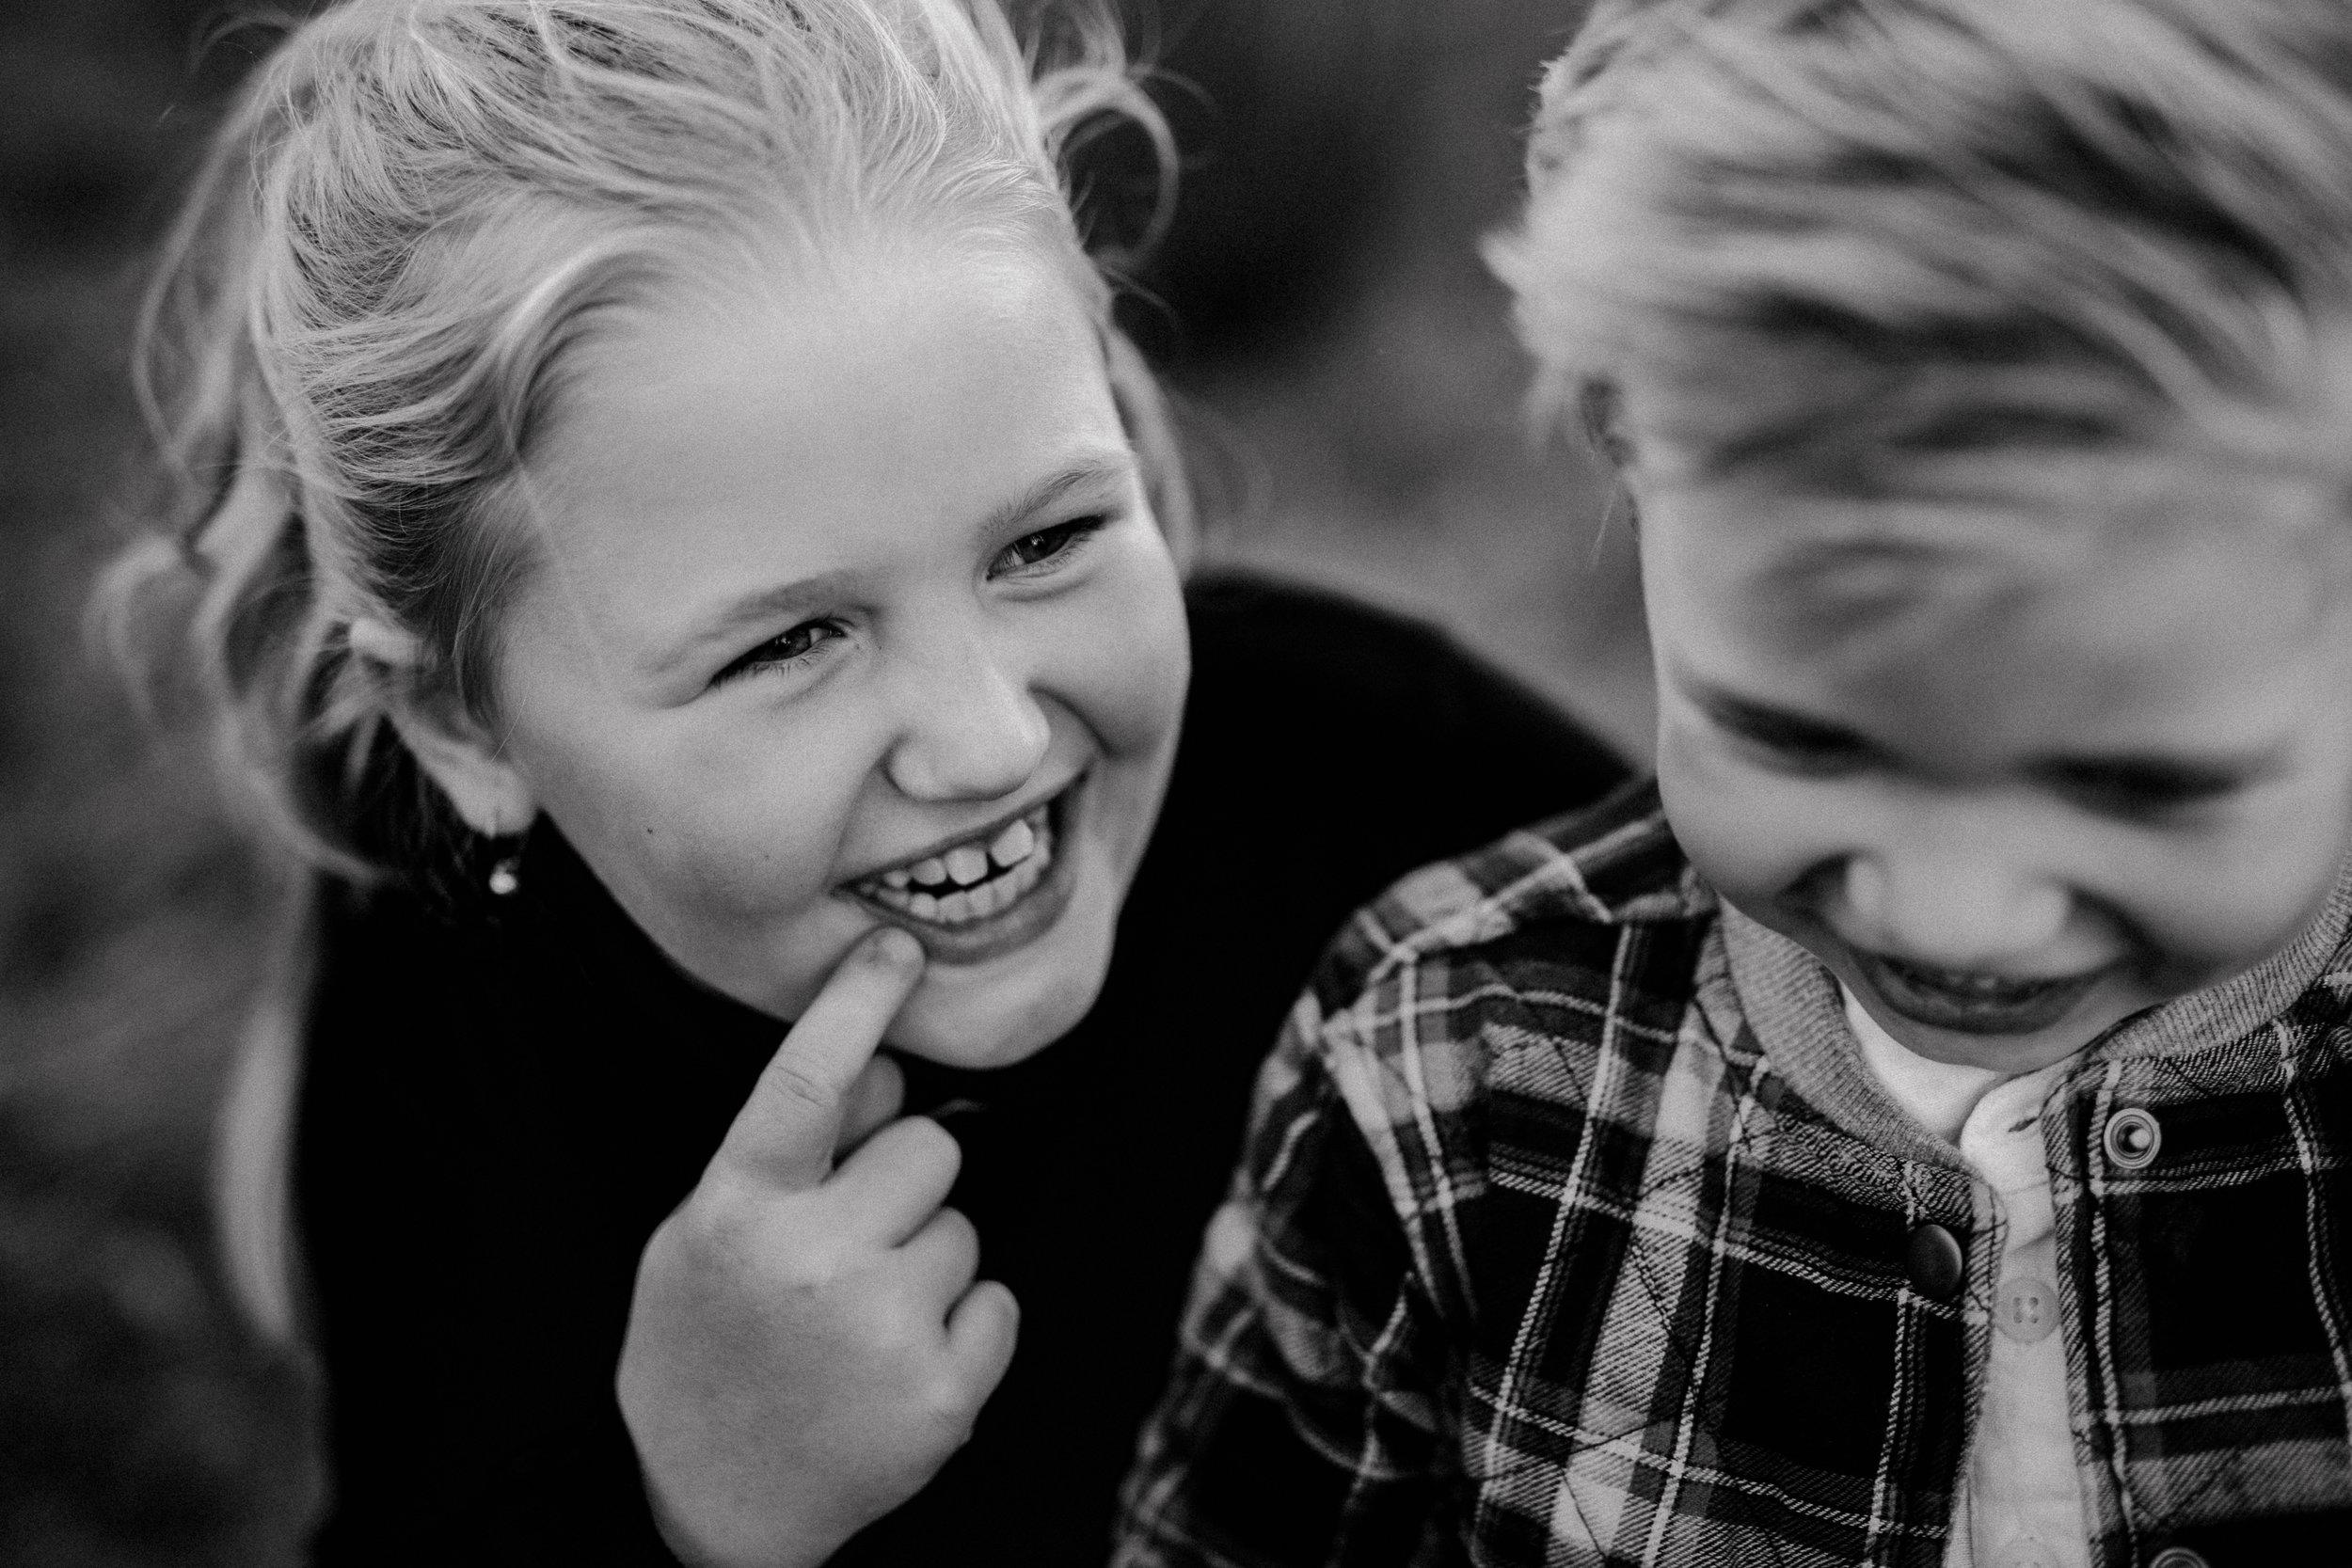 Barnfotograf-Fotograf Emilia-Familjefotograf-9.jpg